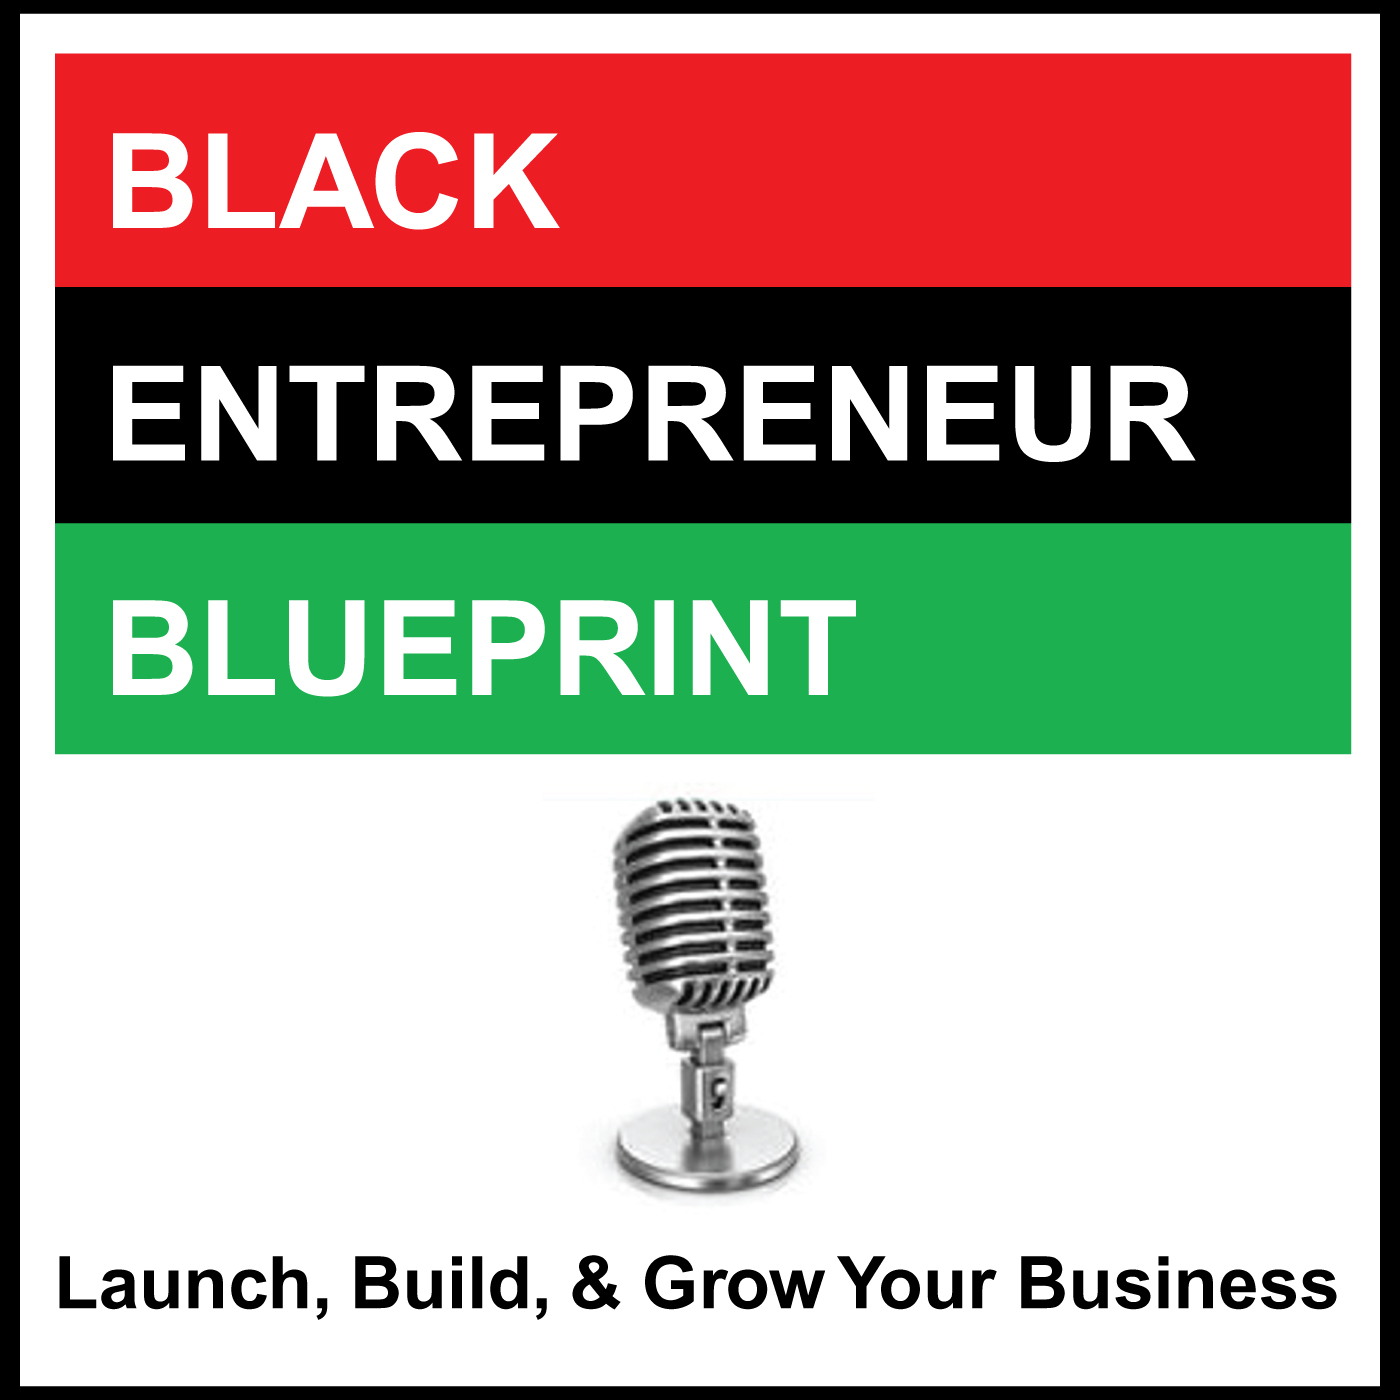 Black Entrepreneur Blueprint: 06 - Kevin Clifton & Robert Jones